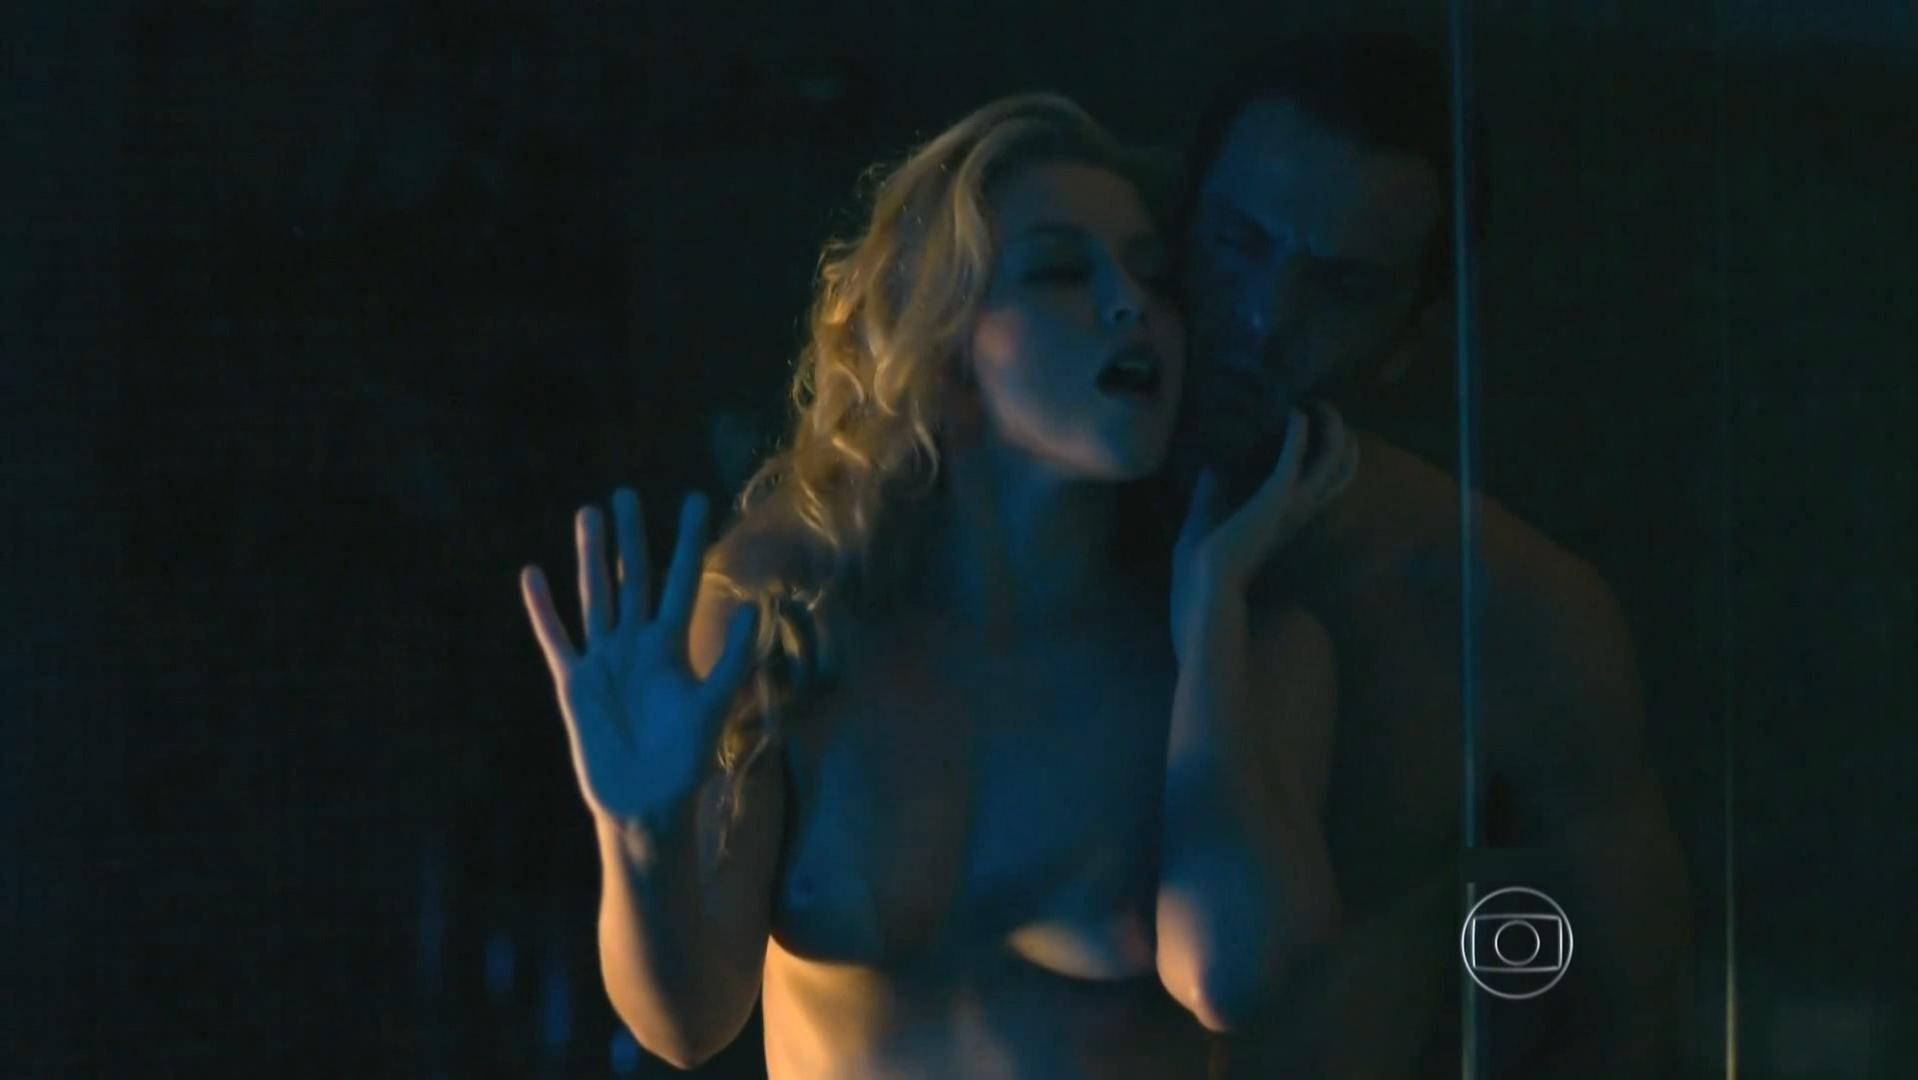 Rhaisa Batista nude - Verdades Secretas s01e15 (2015)